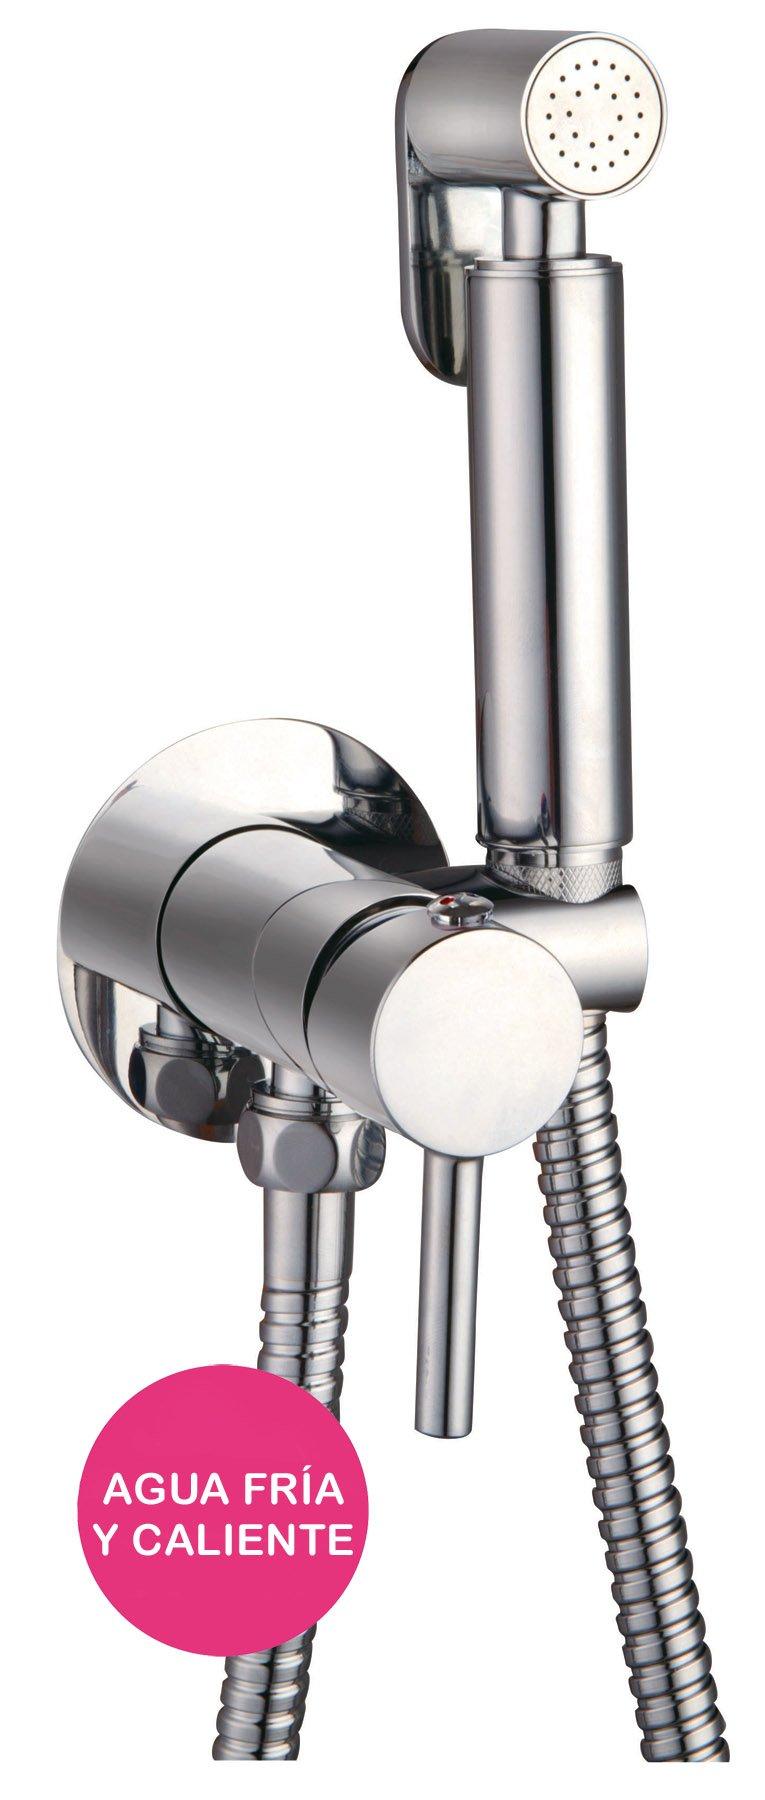 OXEN 1151414, Grifo para bidet – higiene íntima del WC